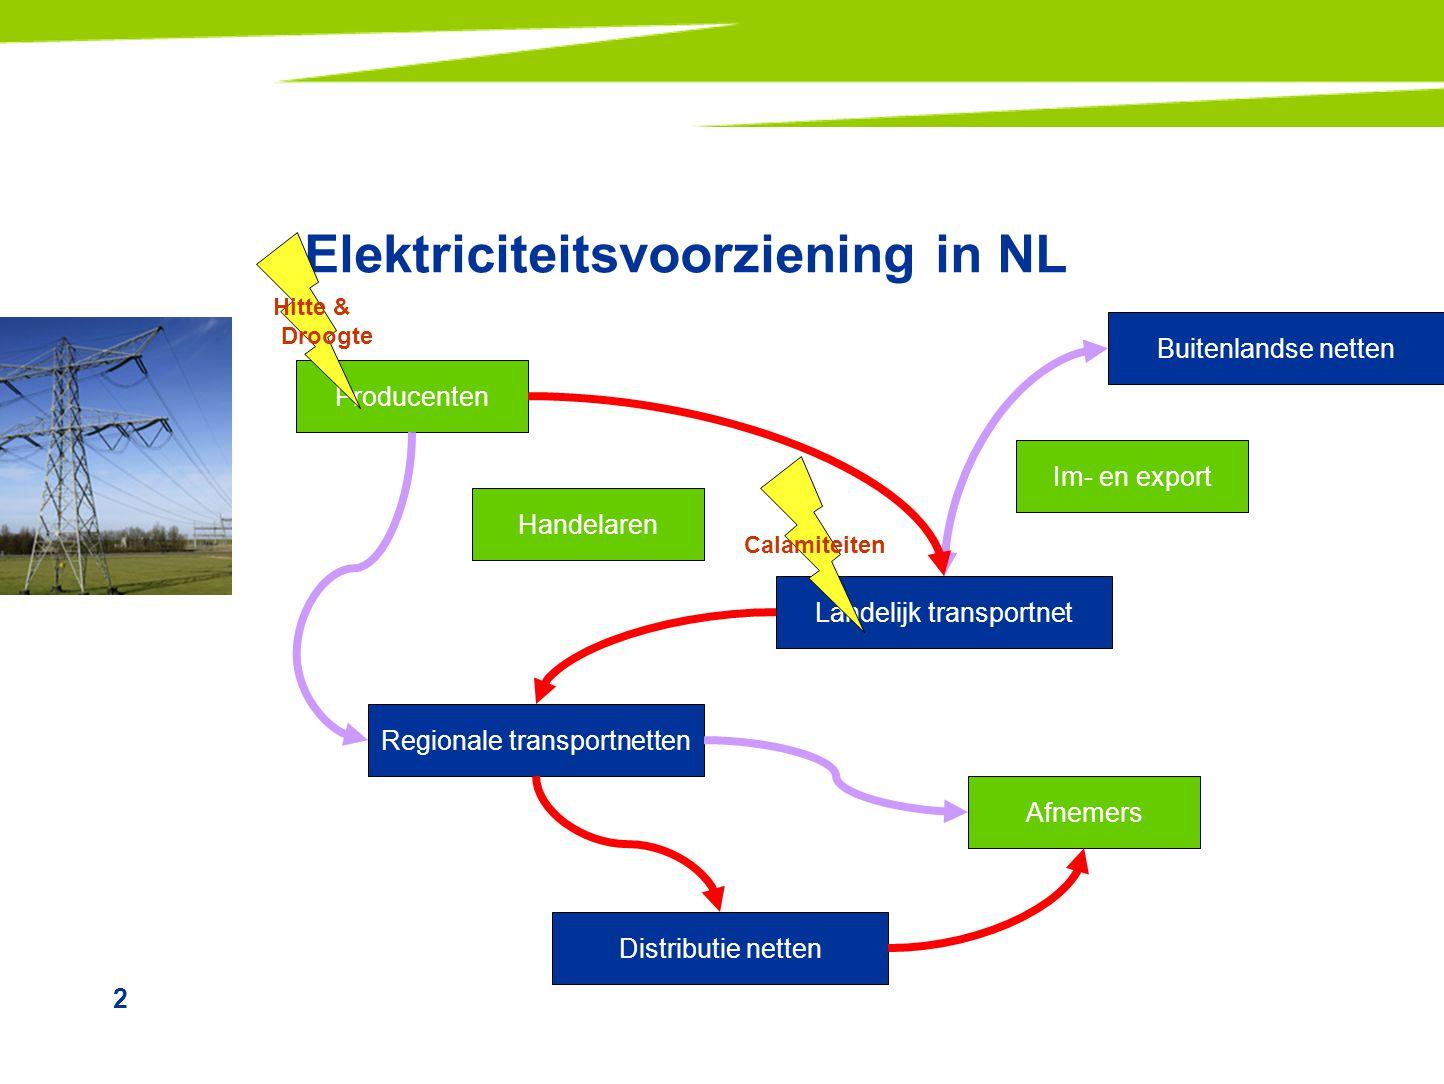 Elektriciteitsvoorziening in NL